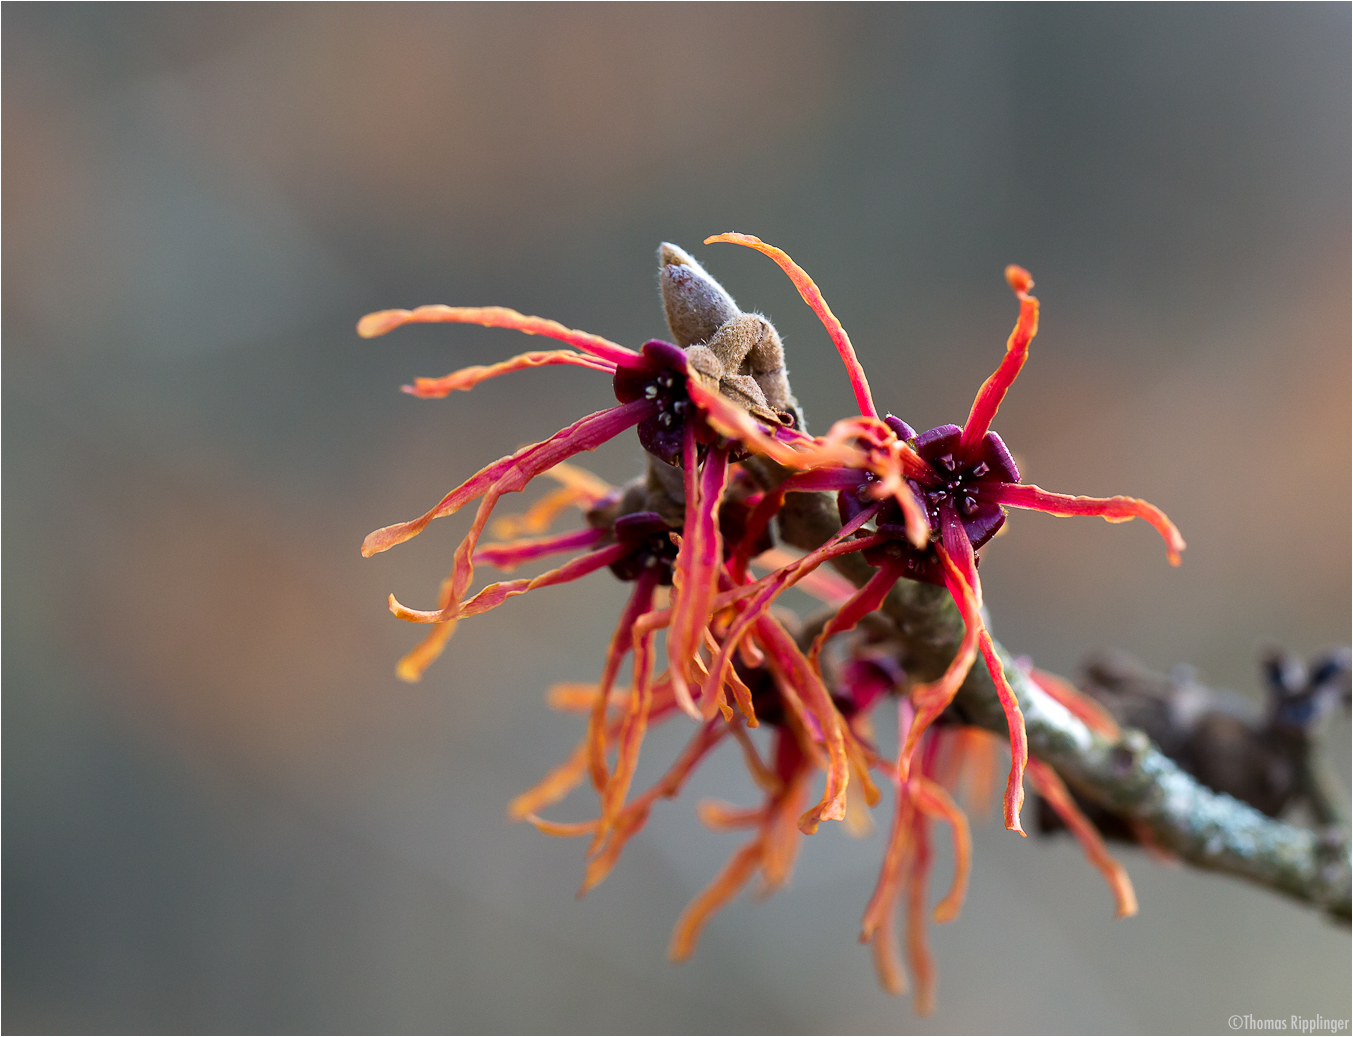 Feuerzauber Zaubernuss (Hamamelis x intermedia)